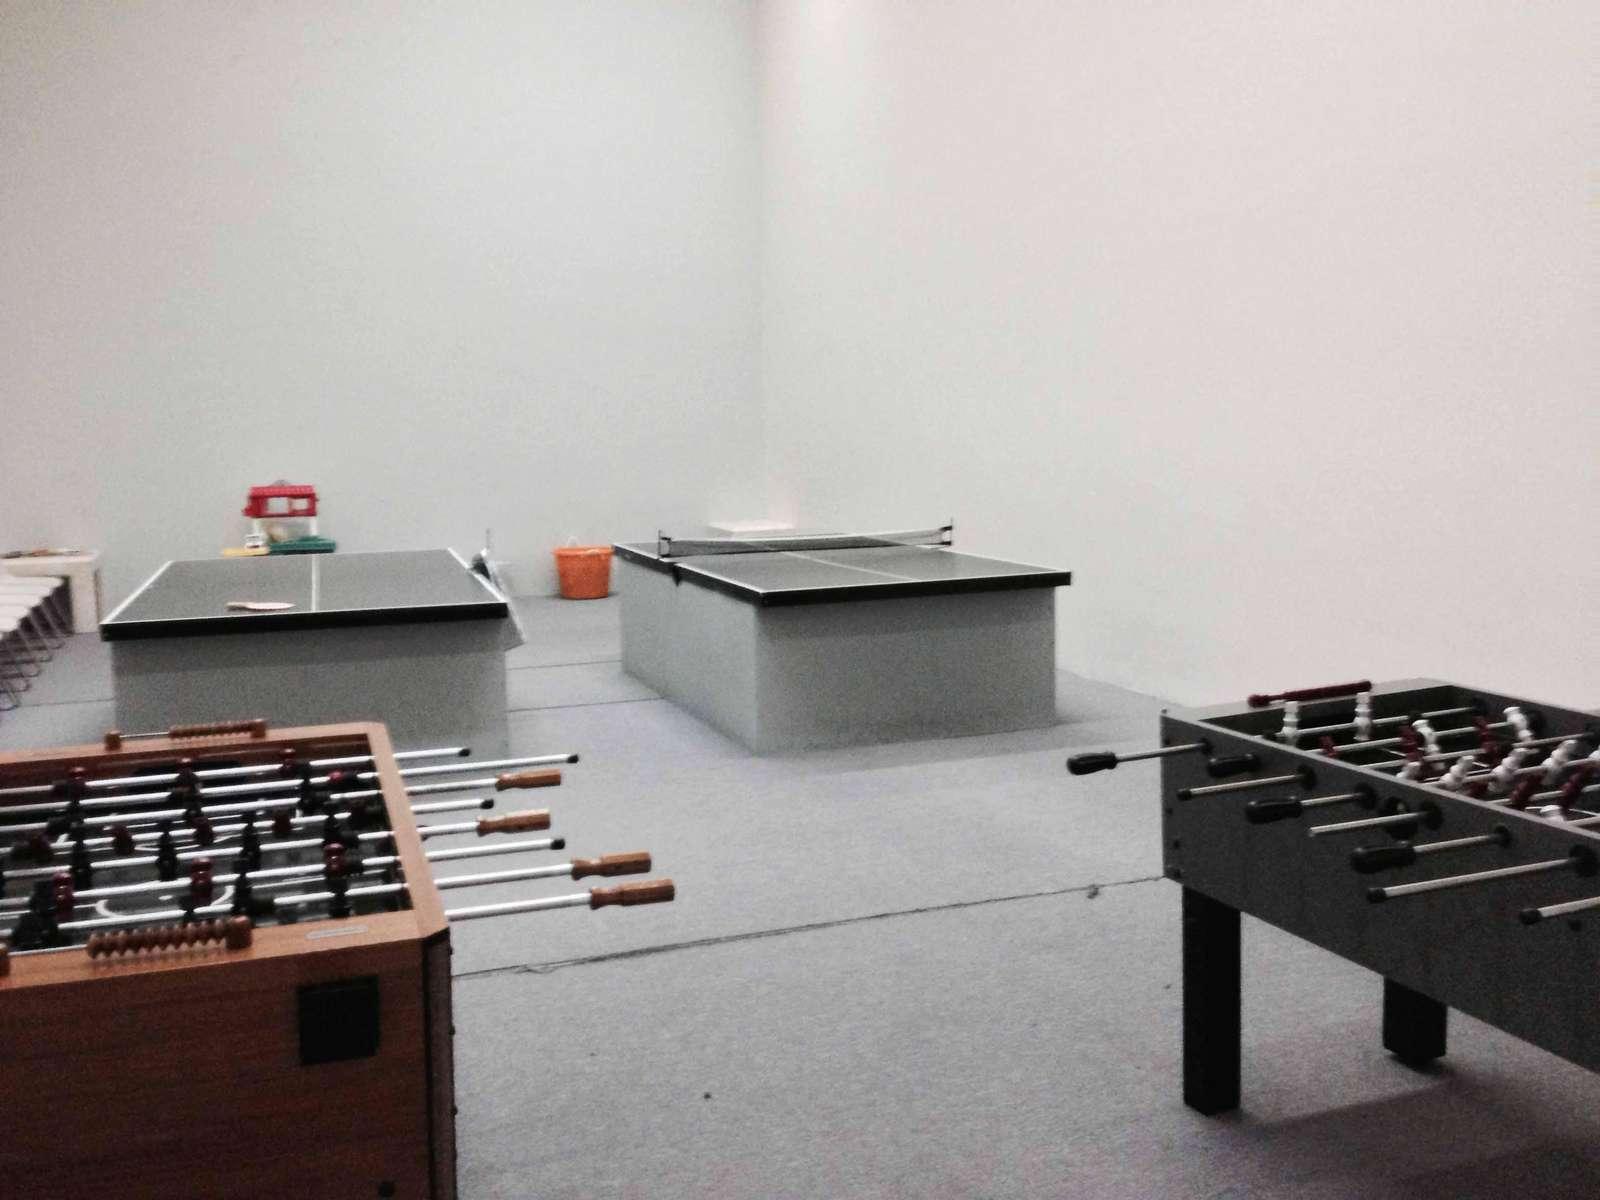 Play Ping Pong or Foosball